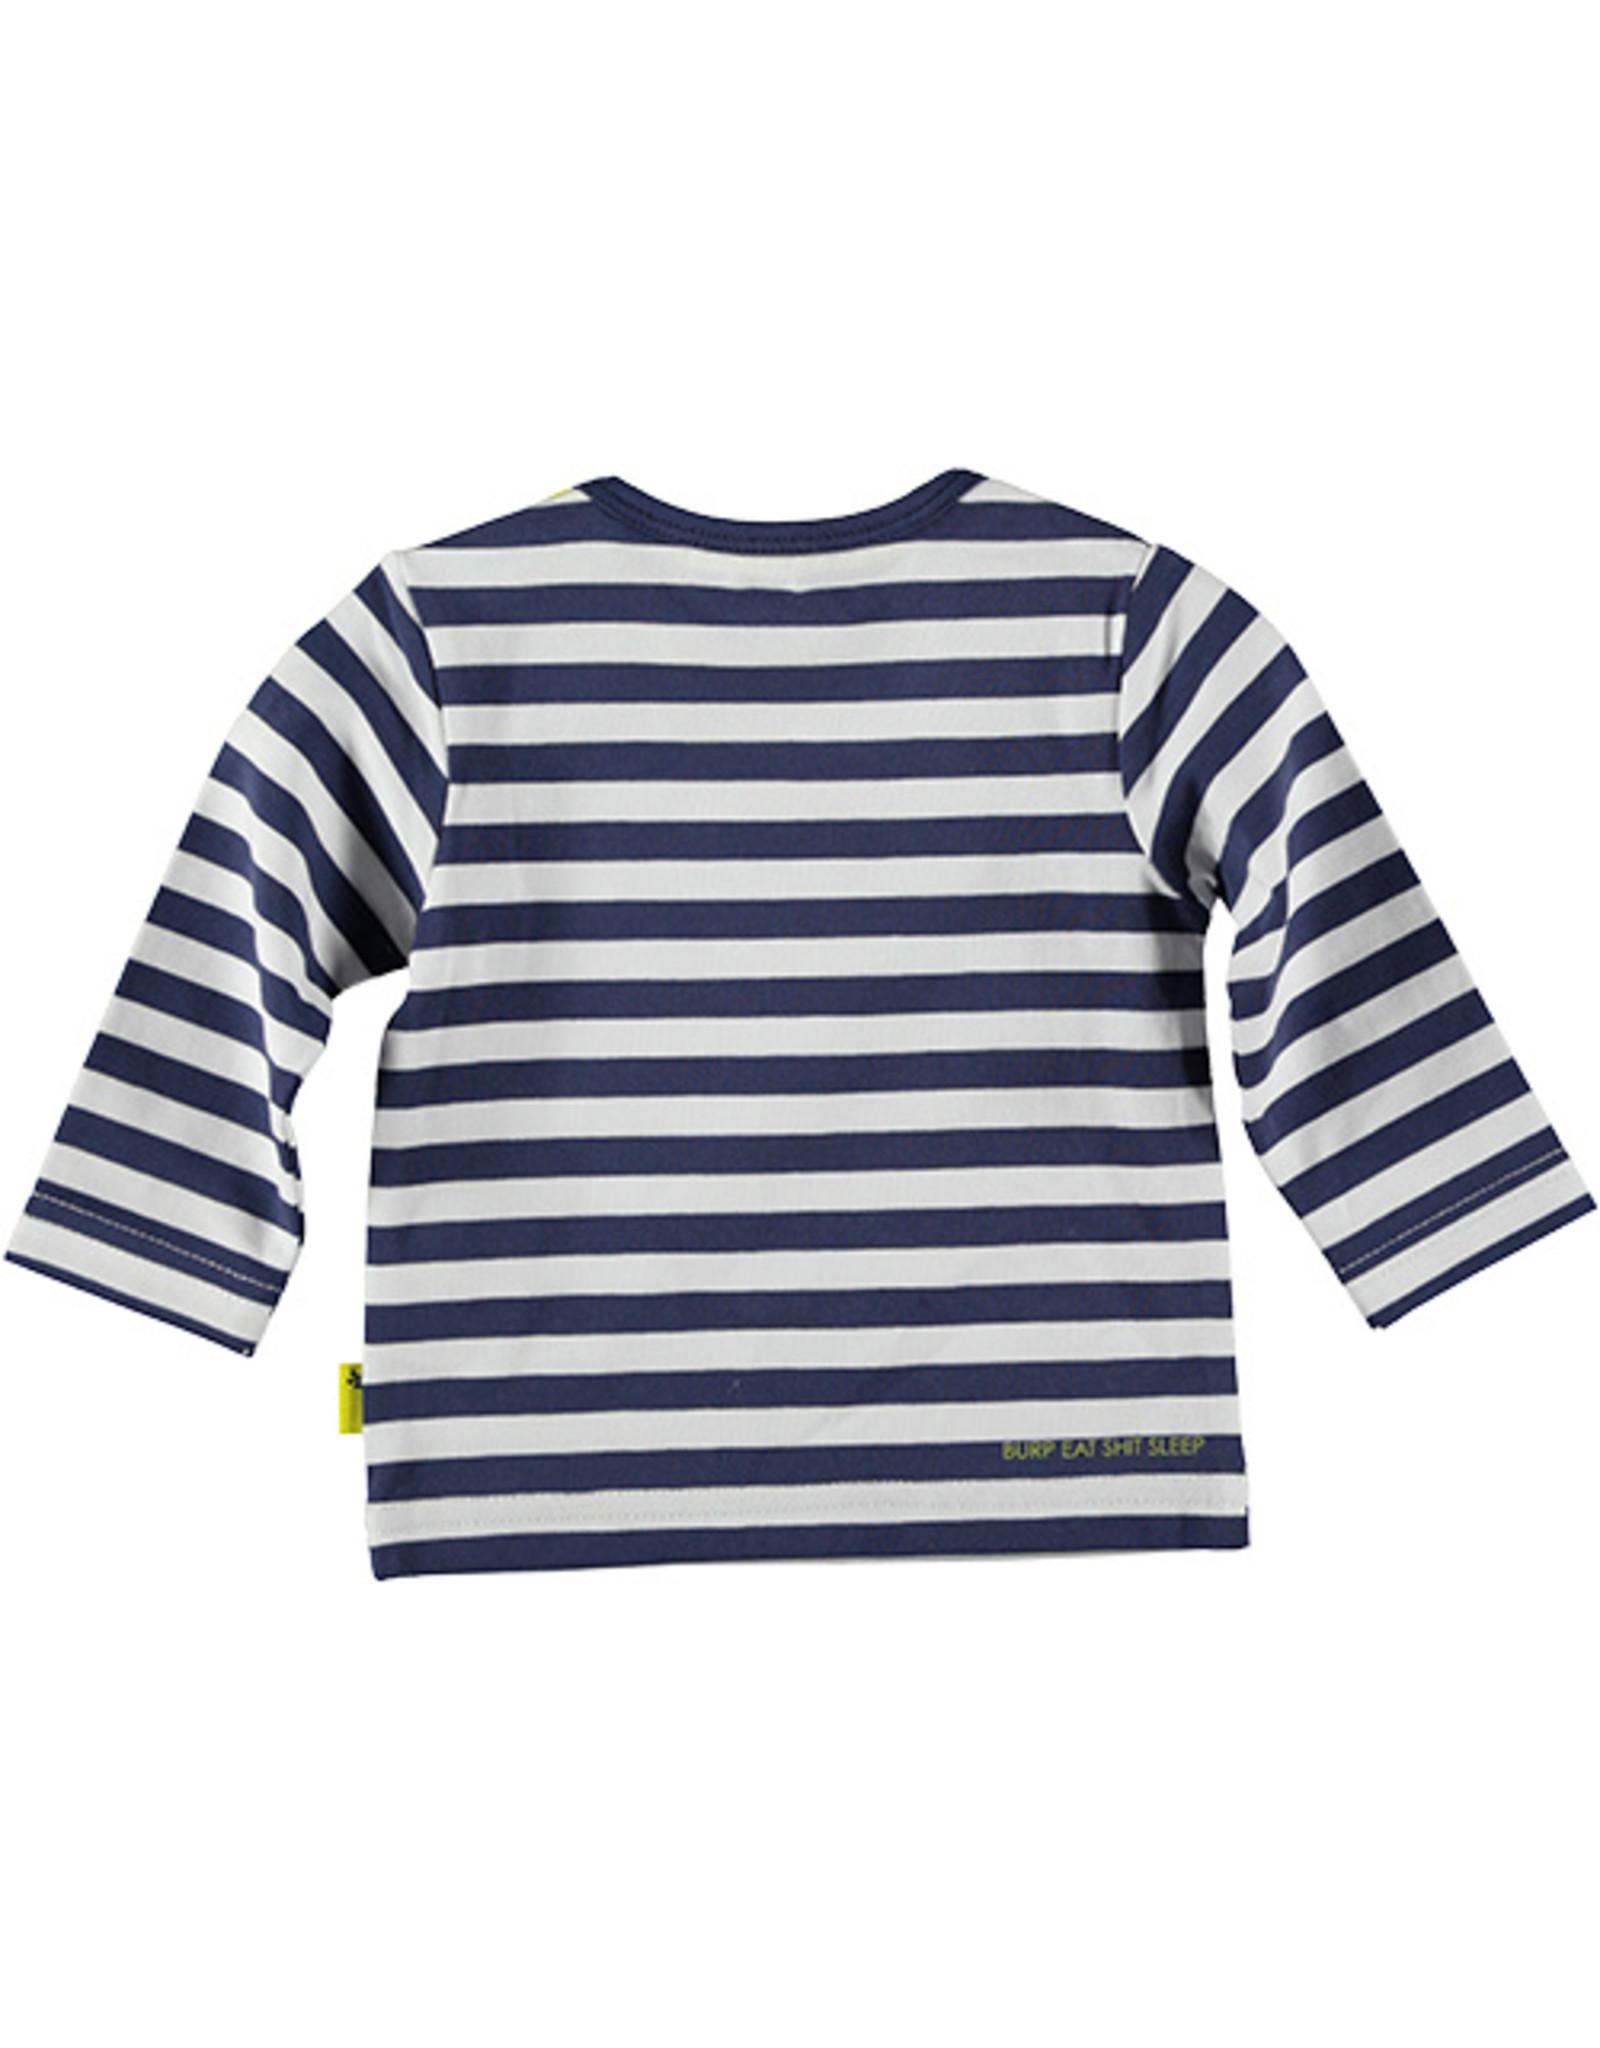 B.E.S.S. Shirt l.sl. Striped Cool For Sure, Blue